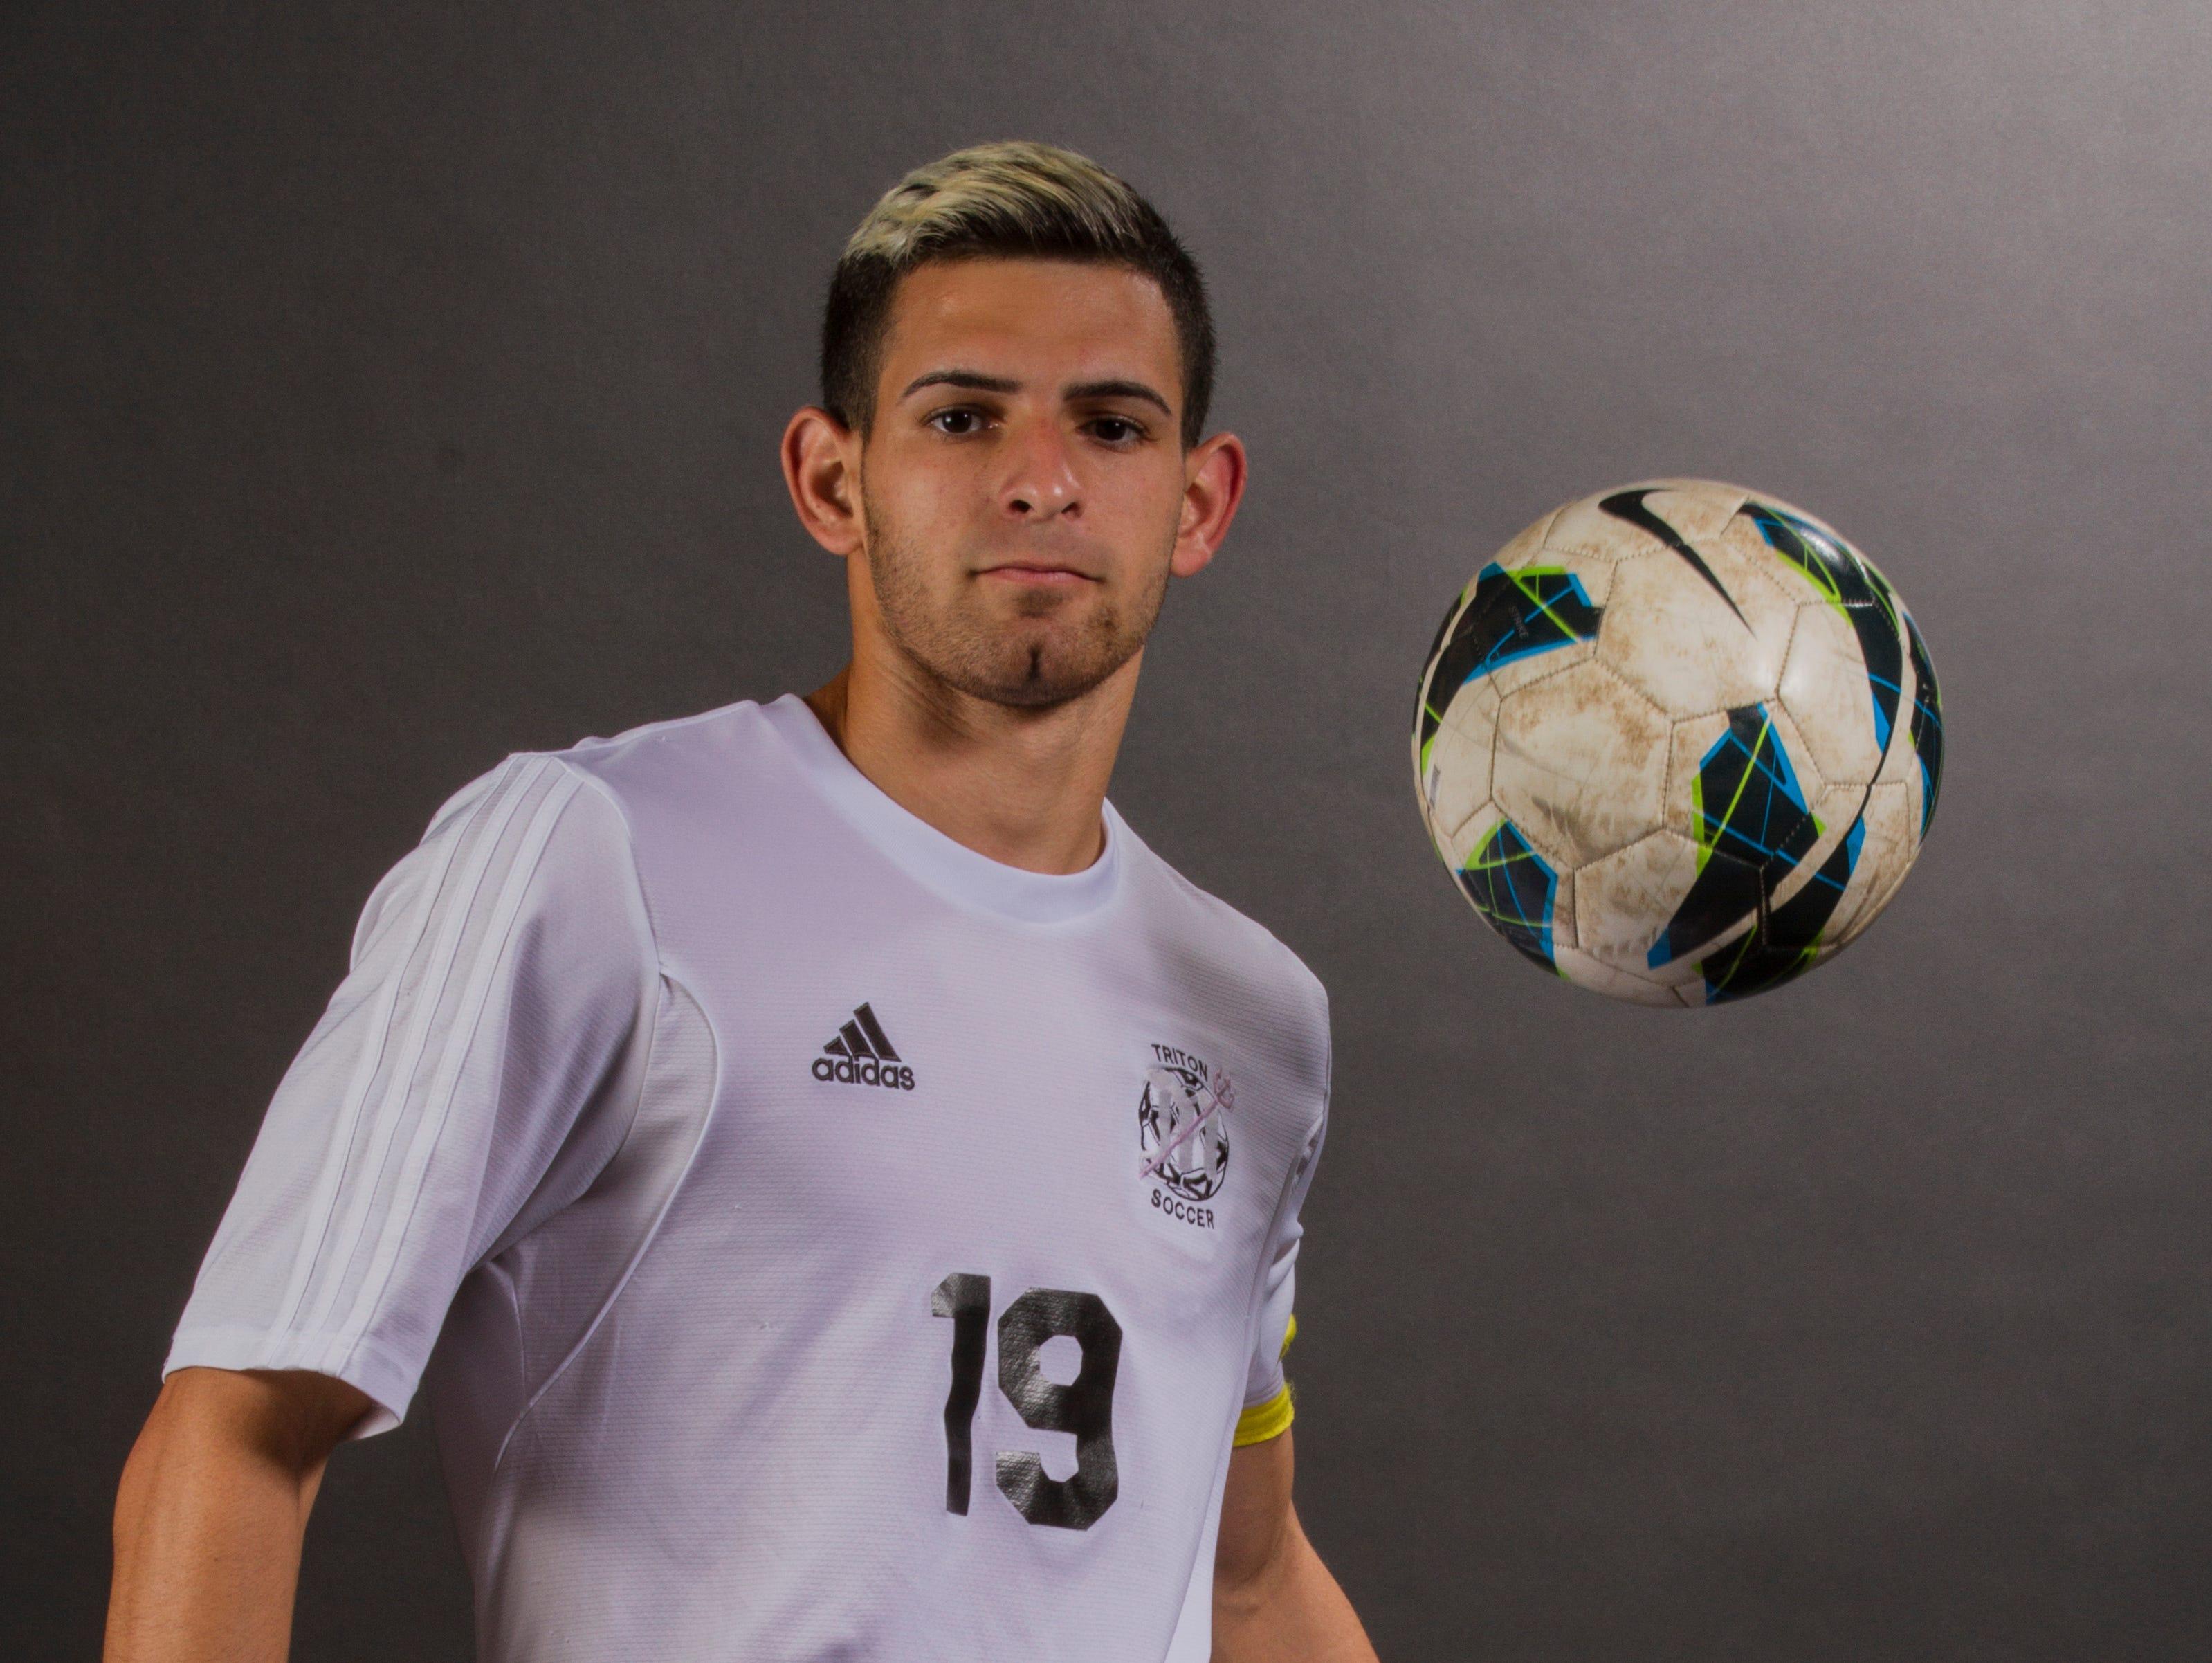 Erick Rivera, 18, is a senior soccer player at Mariner High School.